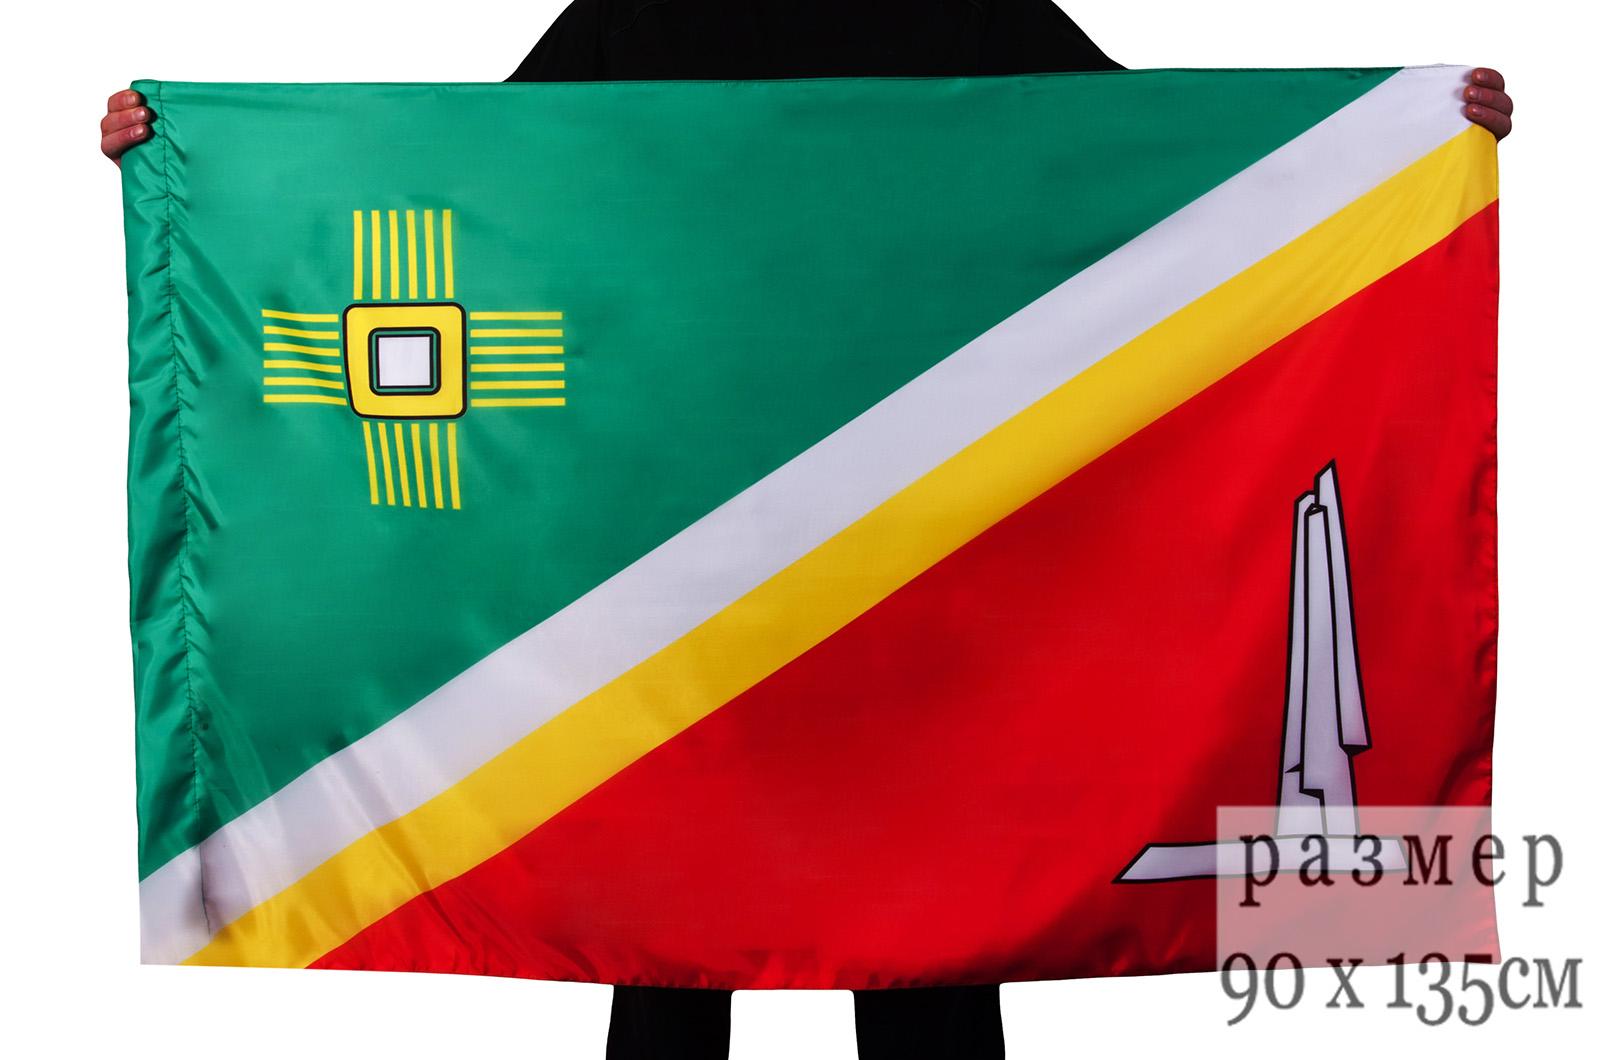 Флаг Зеленограда, Купить флаг Зеленограда